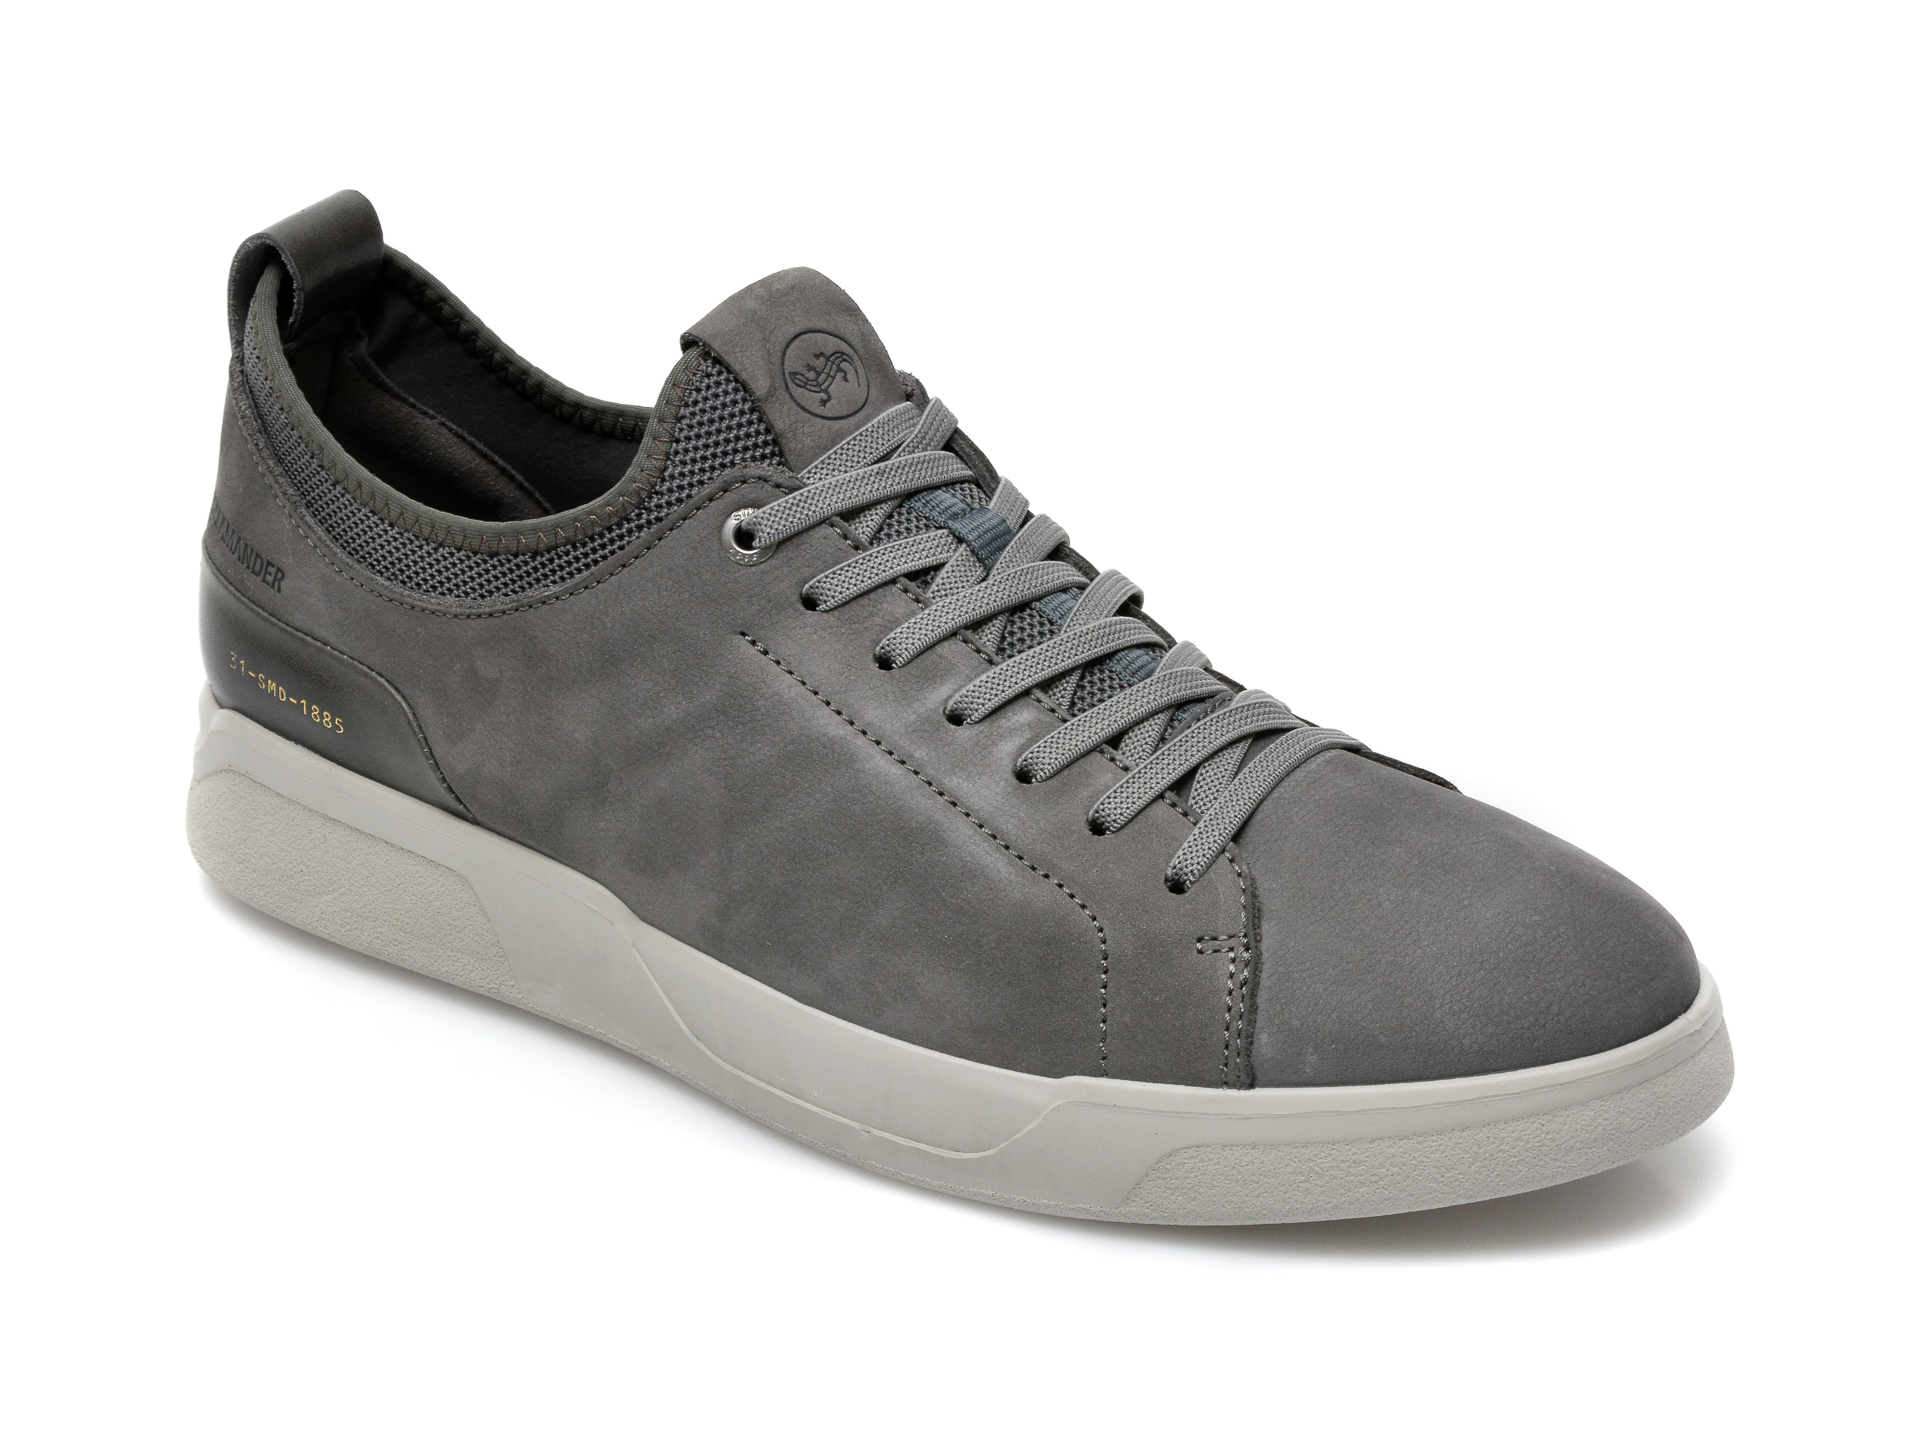 Pantofi SALAMANDER nabuc, 54502, din piele naturala imagine otter.ro 2021